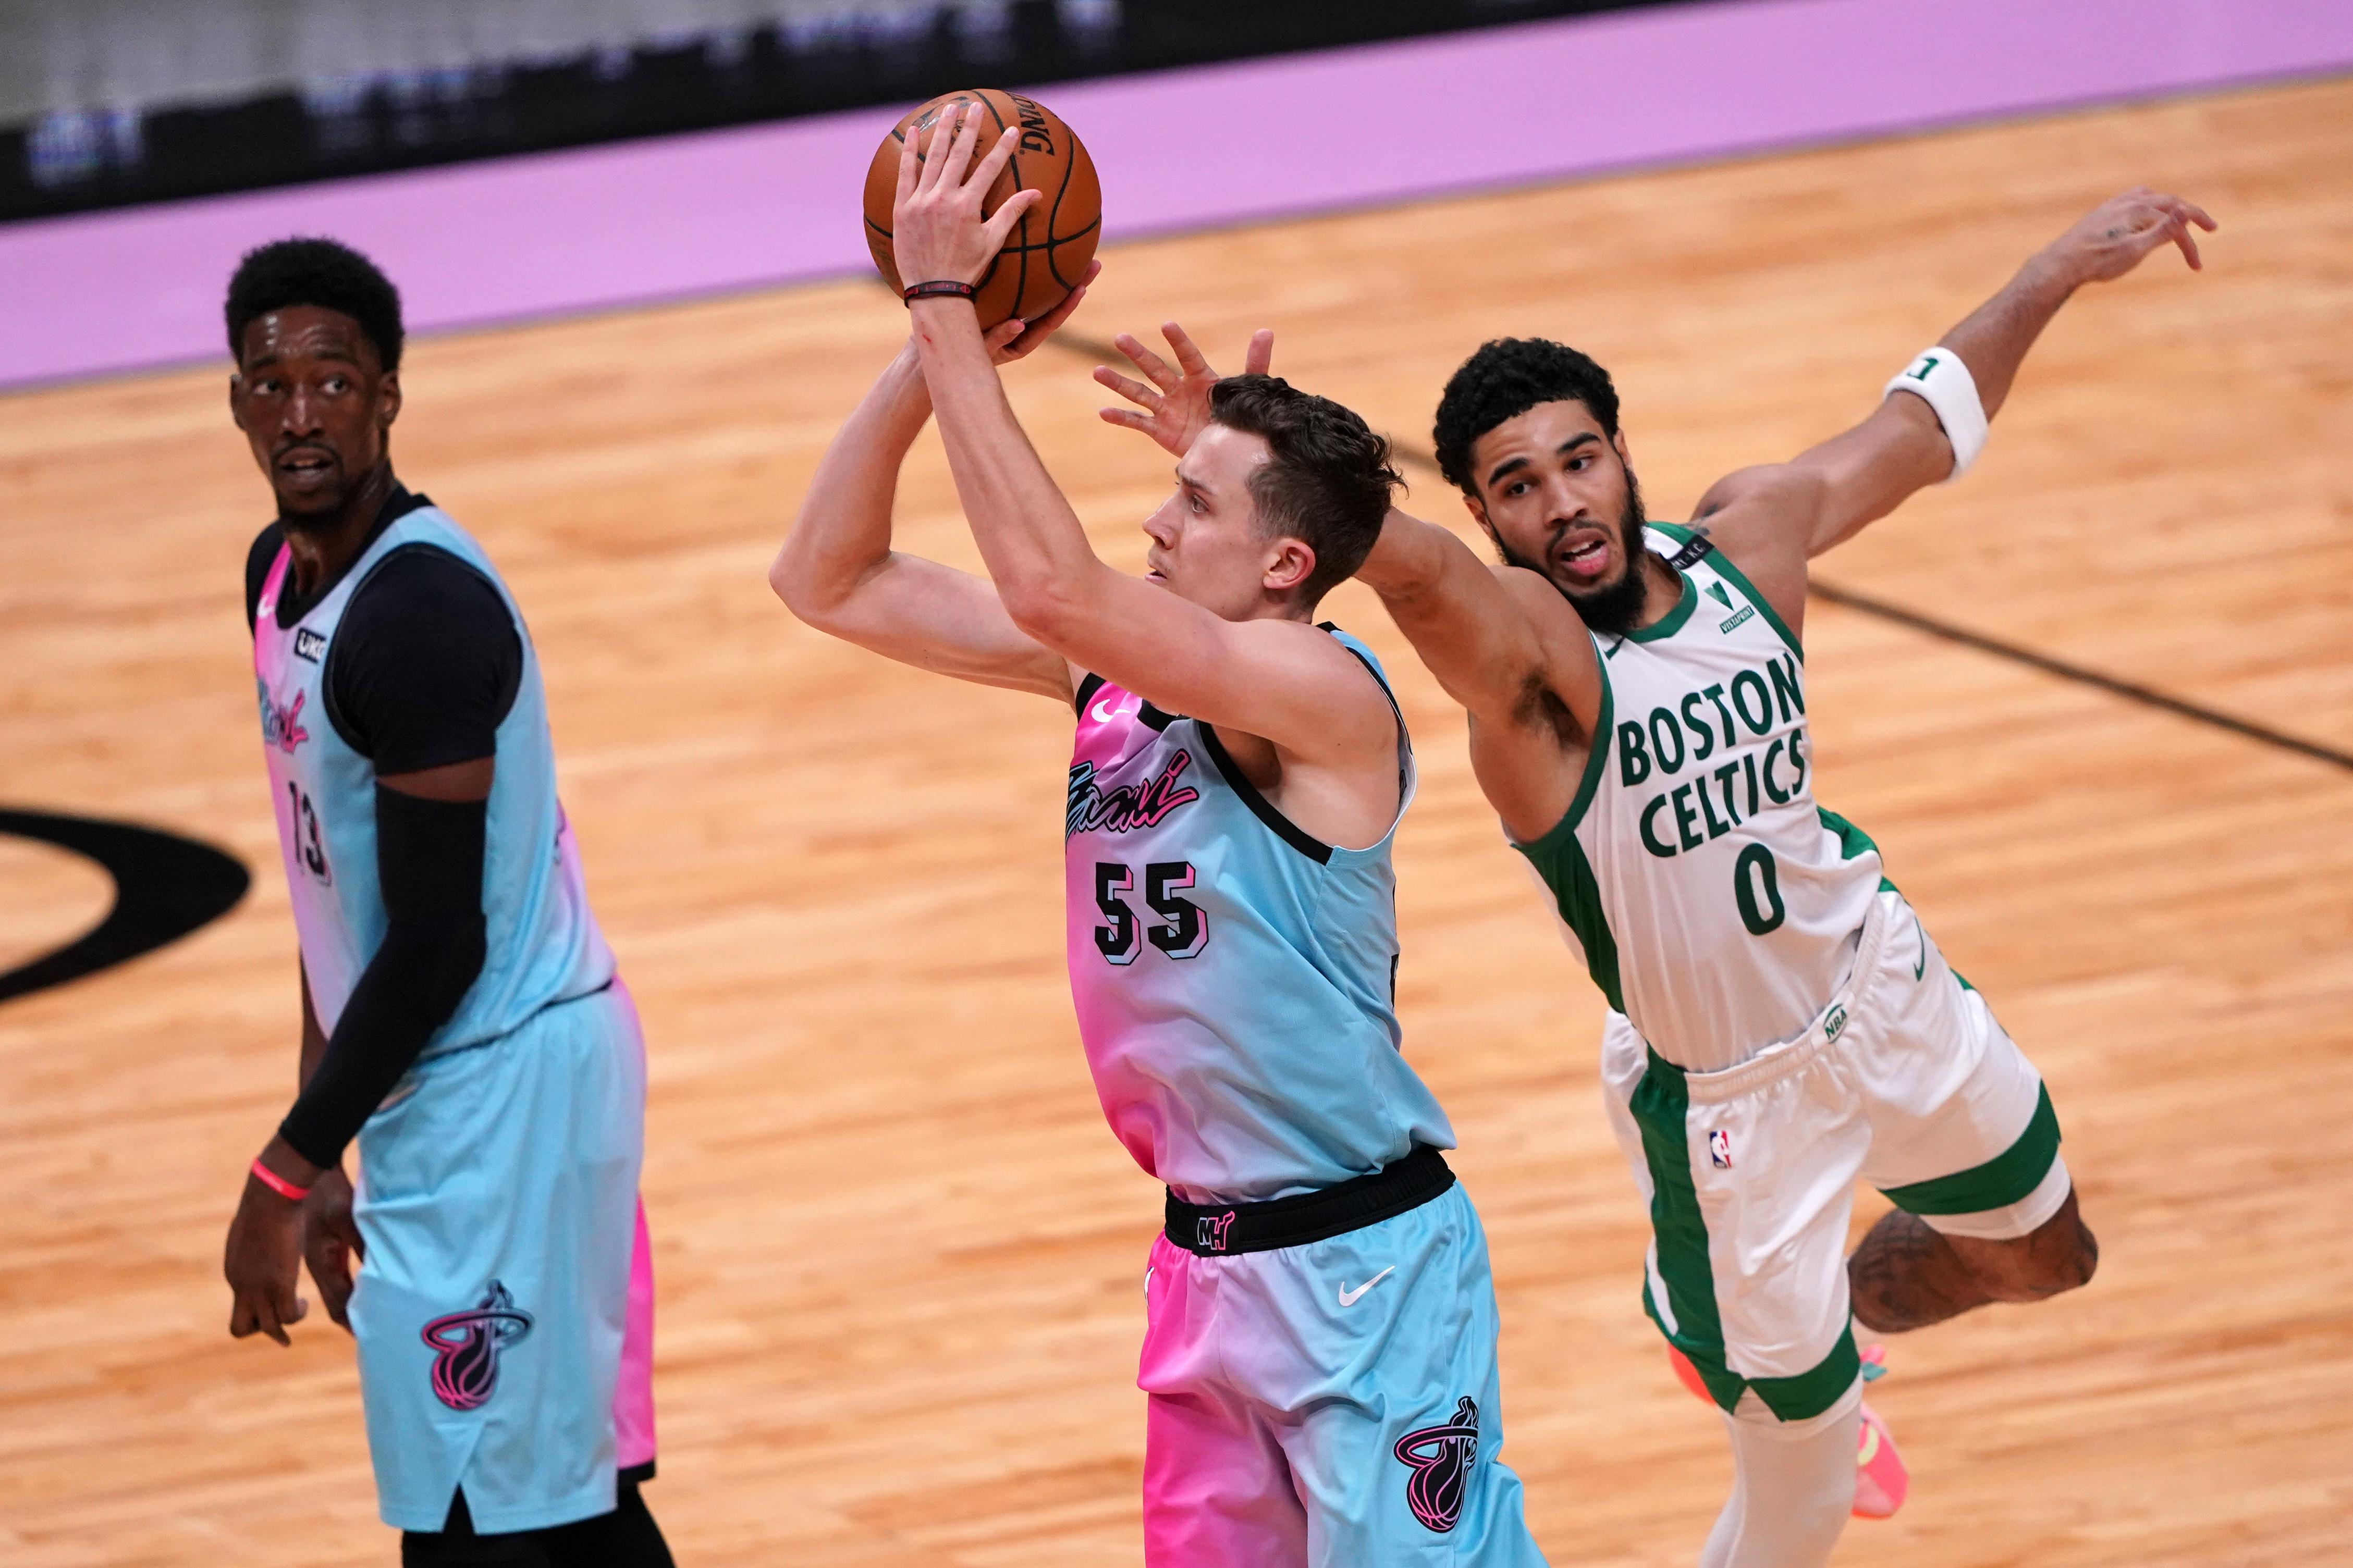 Jan 6, 2021; Miami, Florida, USA; Miami Heat forward Duncan Robinson (55) attempts a three point shot on Boston Celtics forward Jayson Tatum (0) during the second half at American Airlines Arena.